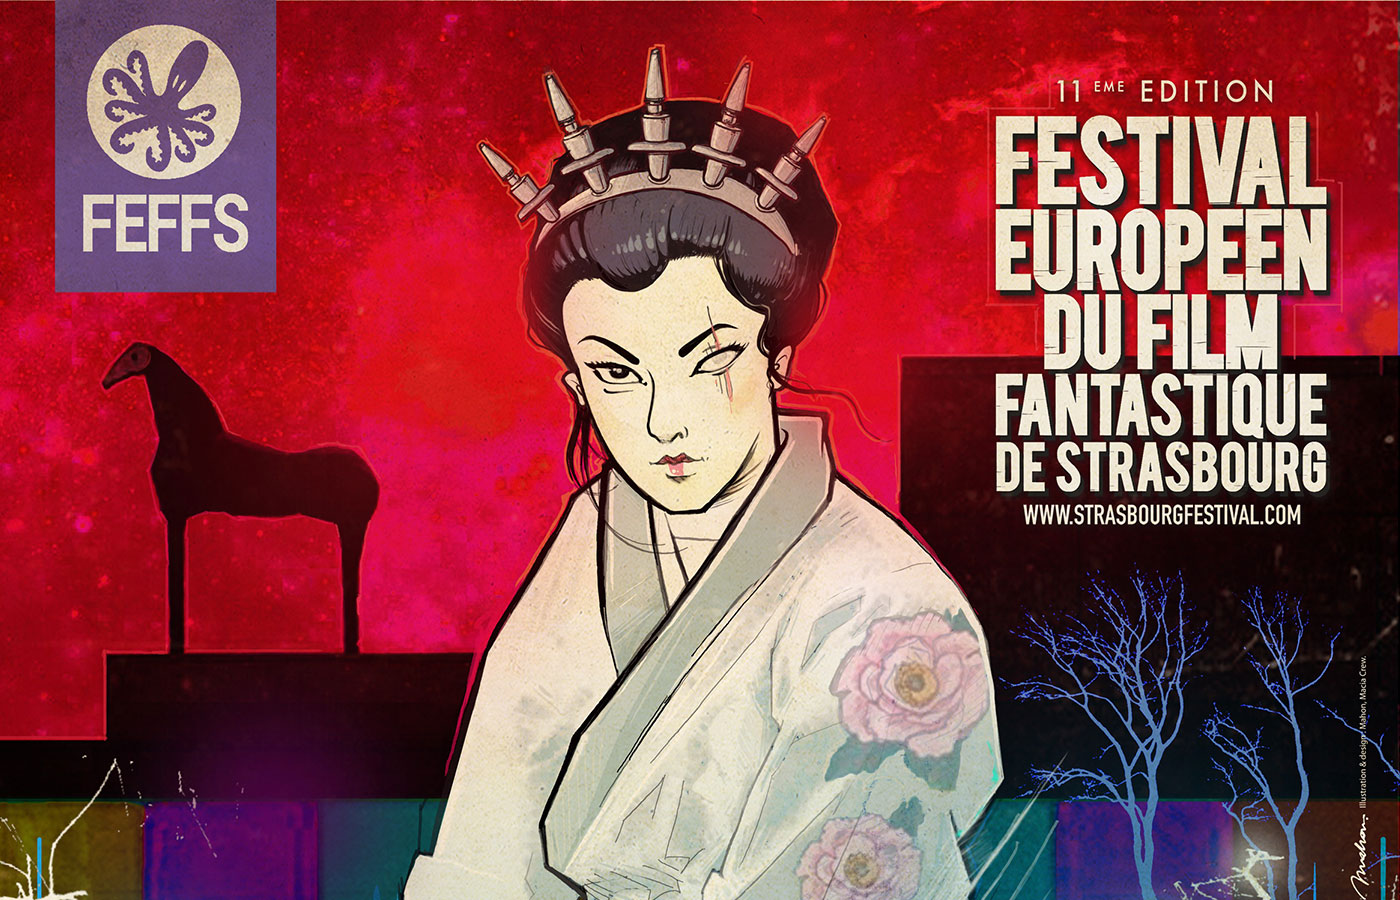 FEFFS 2018 - Festival Européen du Film Fantastique de Strasbourg